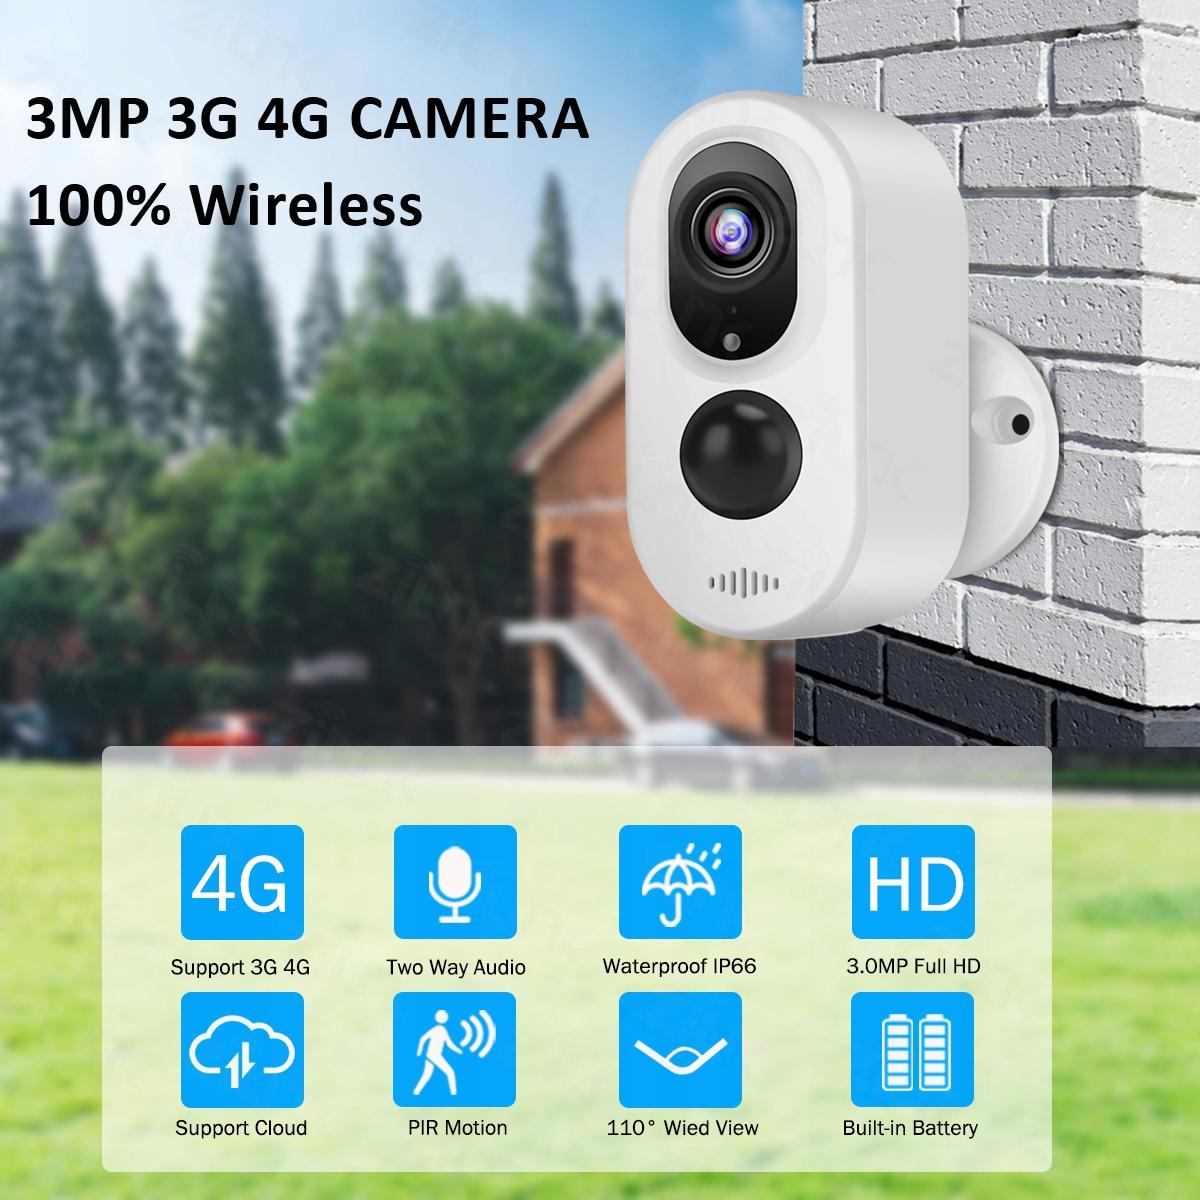 Kamera LTE 3G 4G bezprzewodowa na baterie MicroSD Model 4G